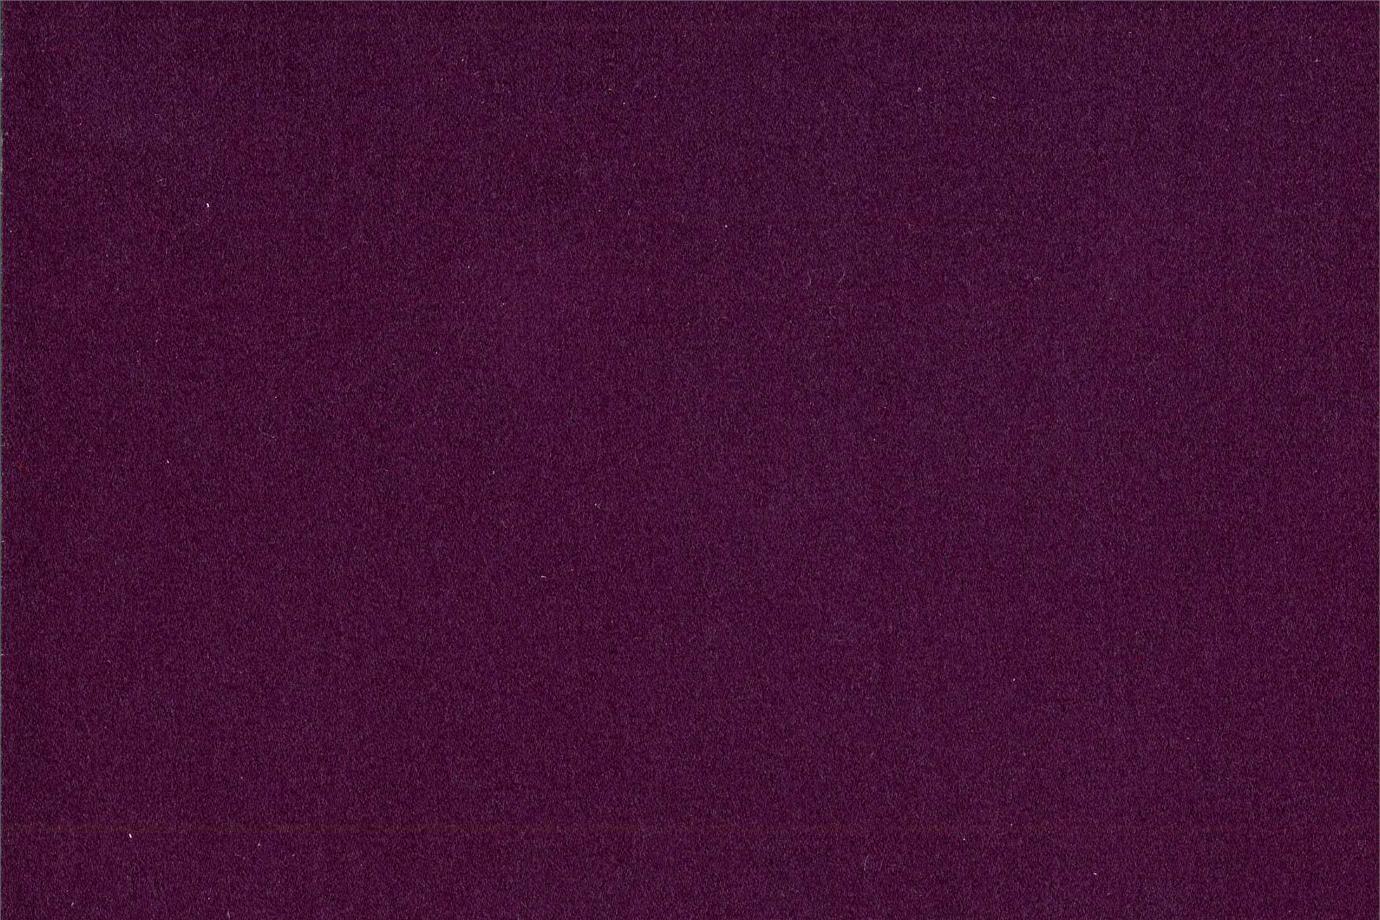 J1594 Meo Patacca 013 Melanzana Brochier